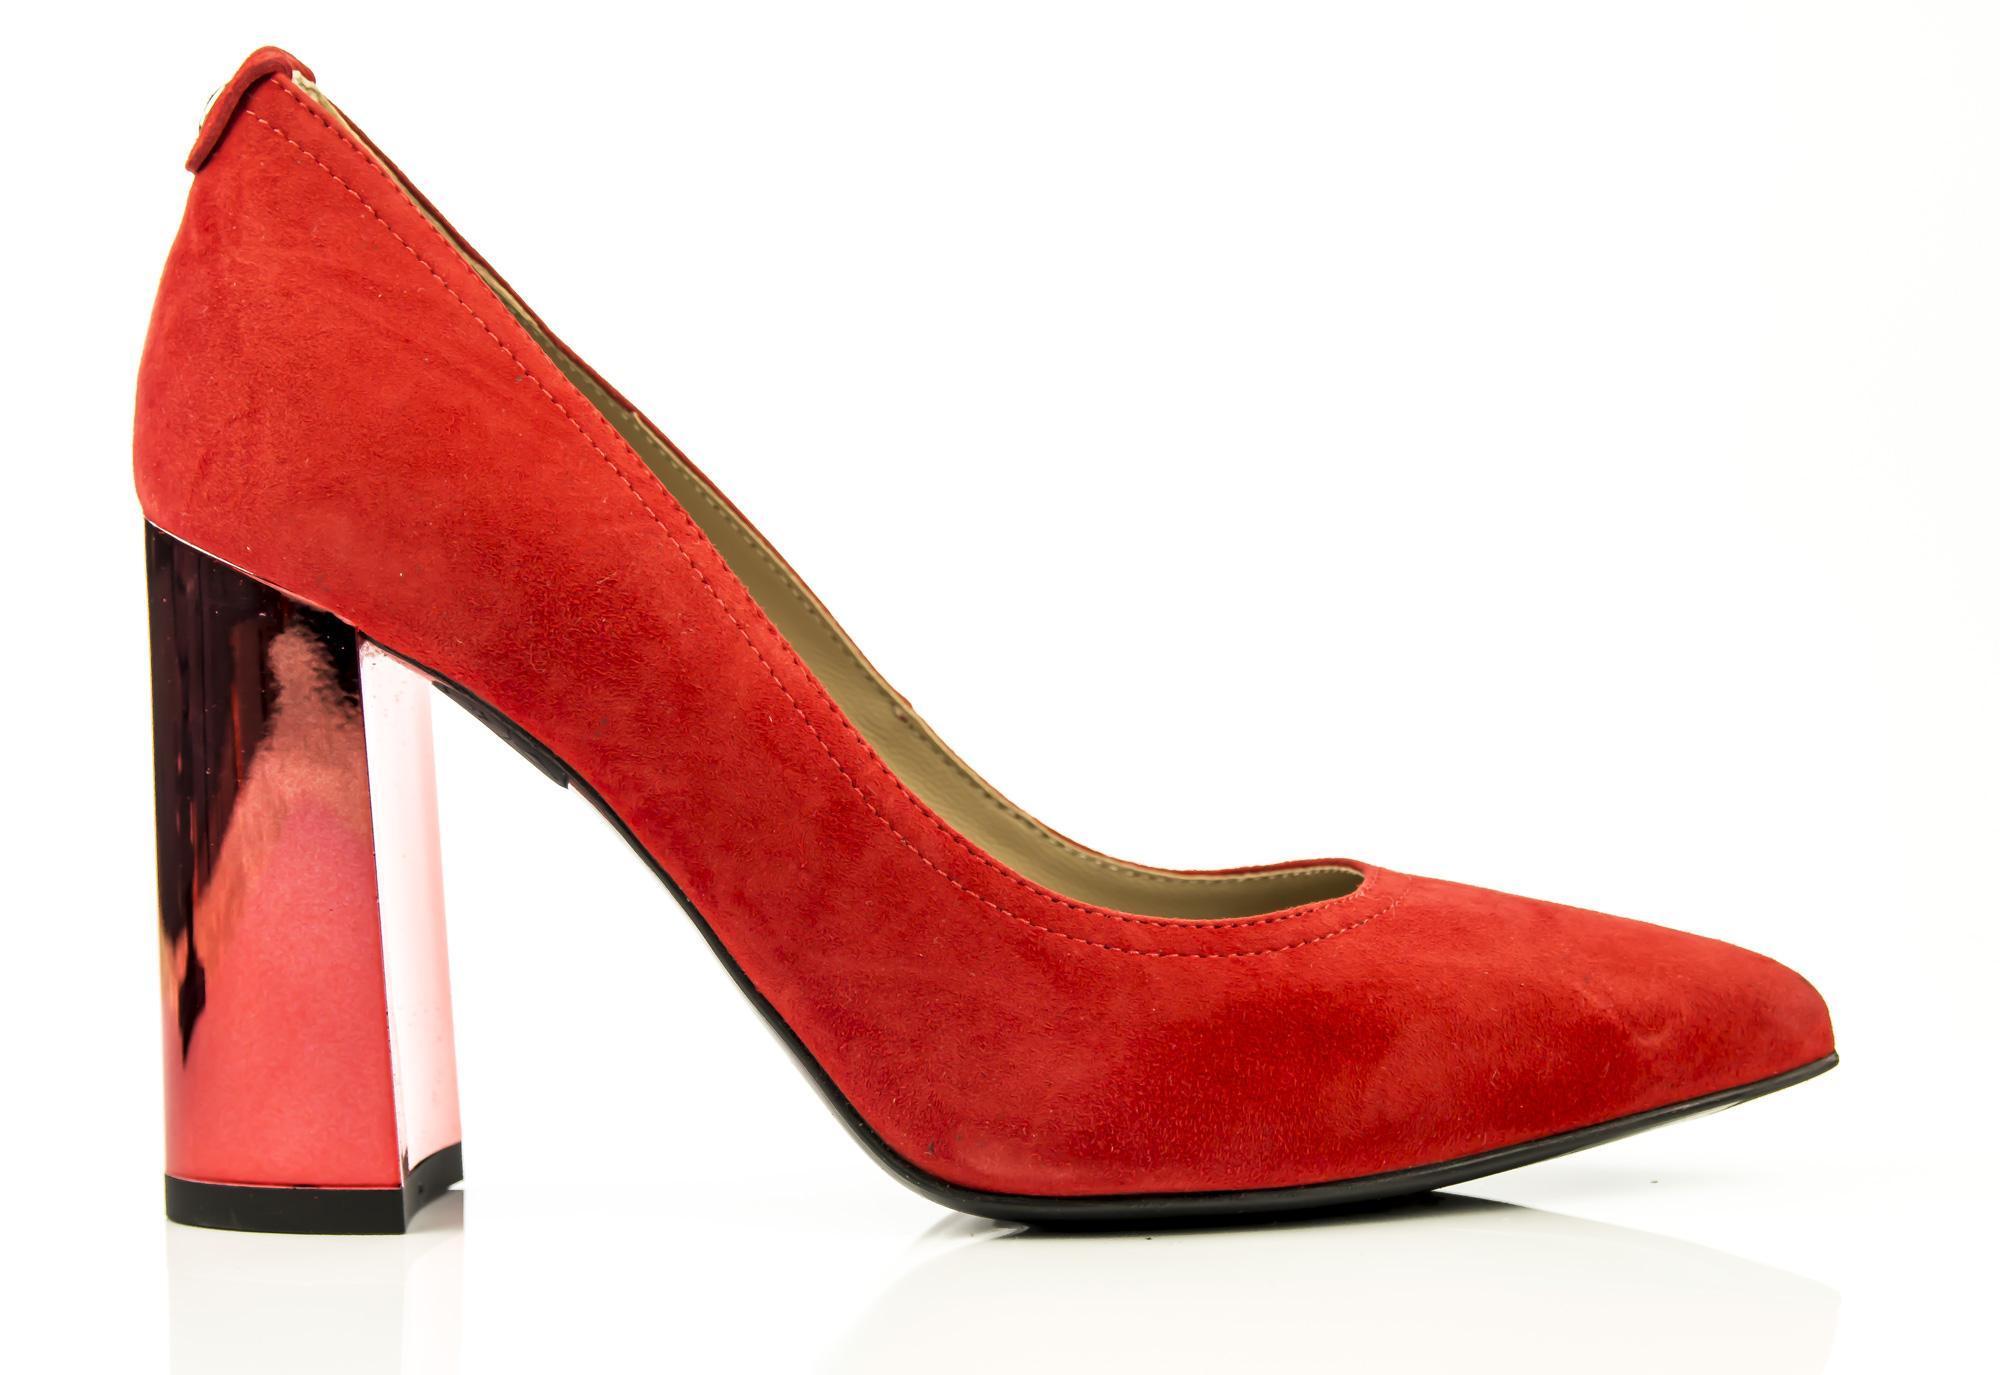 finest selection 4f59d b7225 Dettagli su Decollete NeroGiardini P907930-600 907930 scarpe donna rosse  eleganti